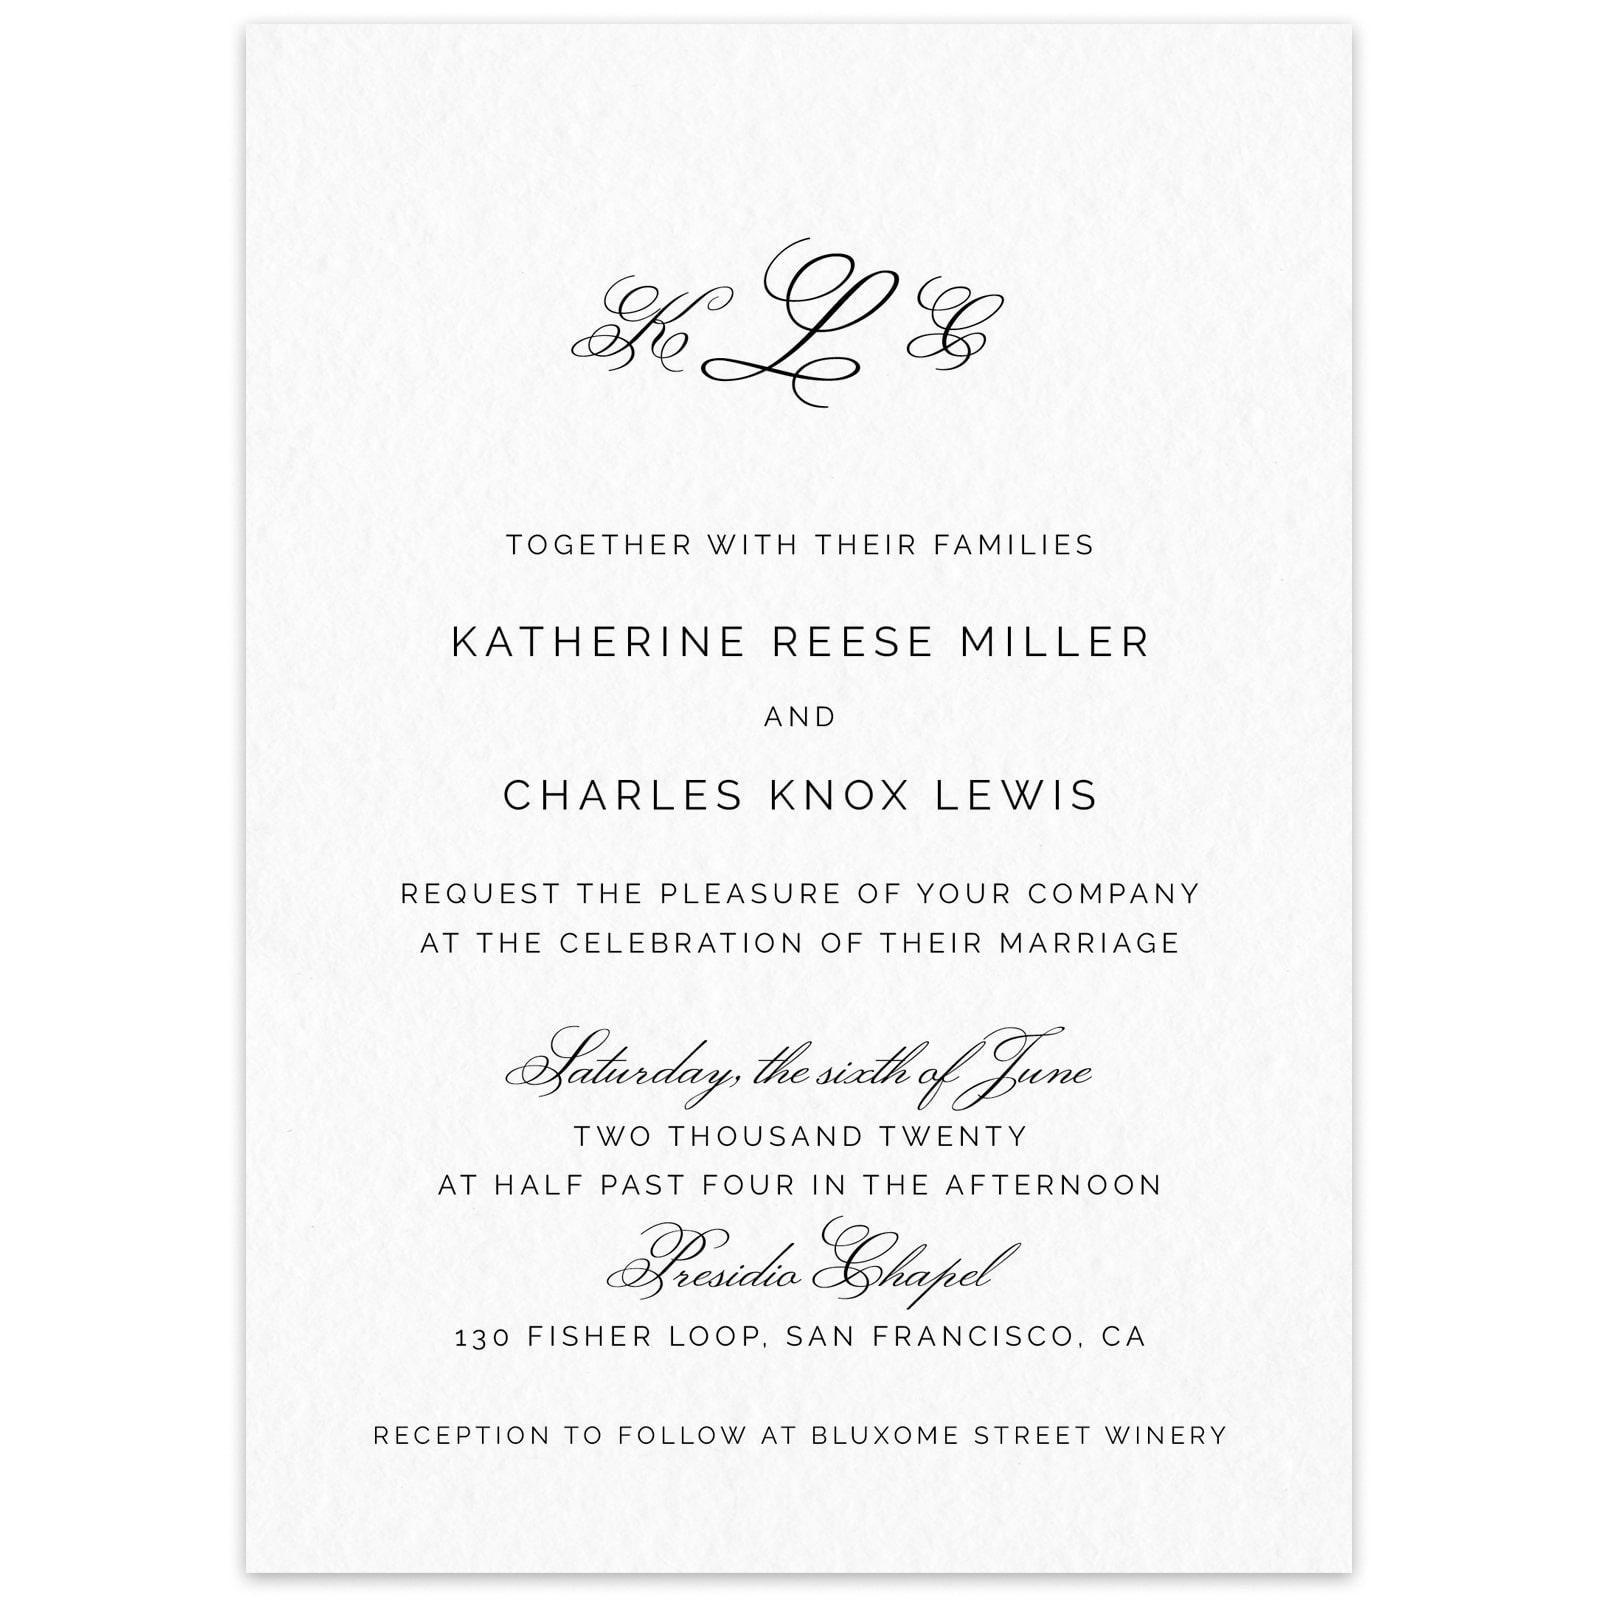 Wedding Venues Near Me Cheap: Wedding Invitation